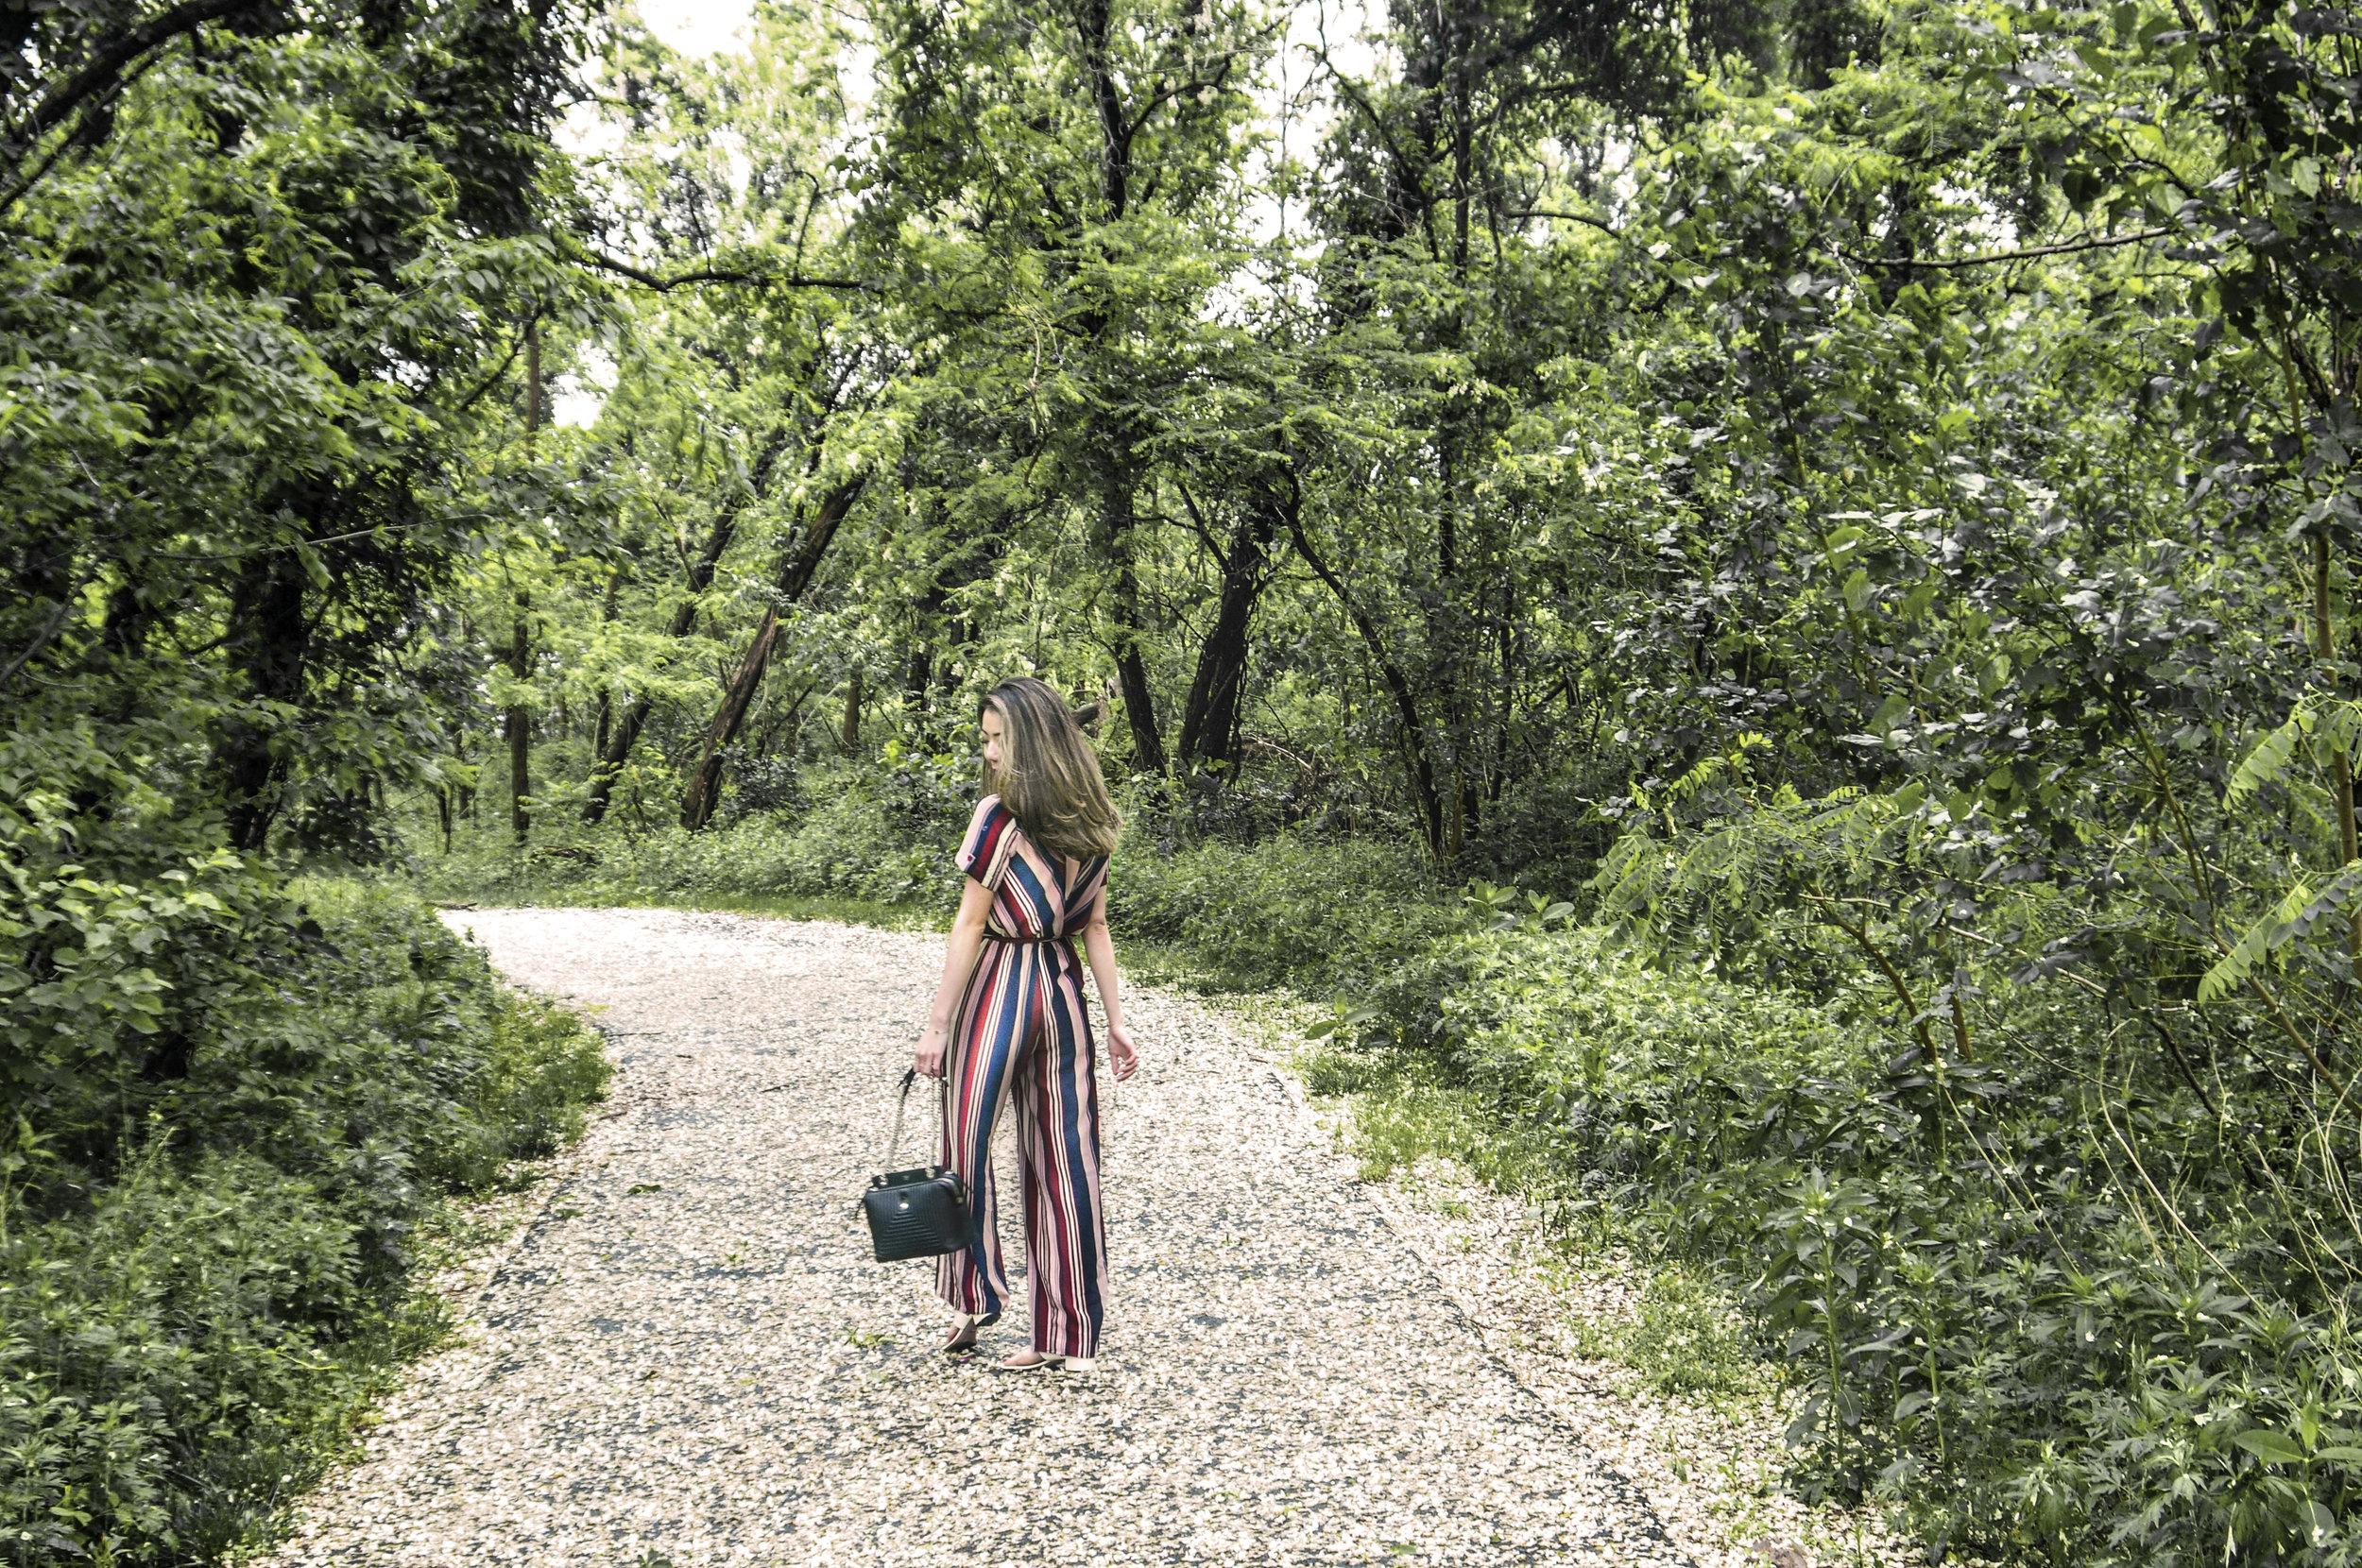 Walking In The Woods - 06.14.18